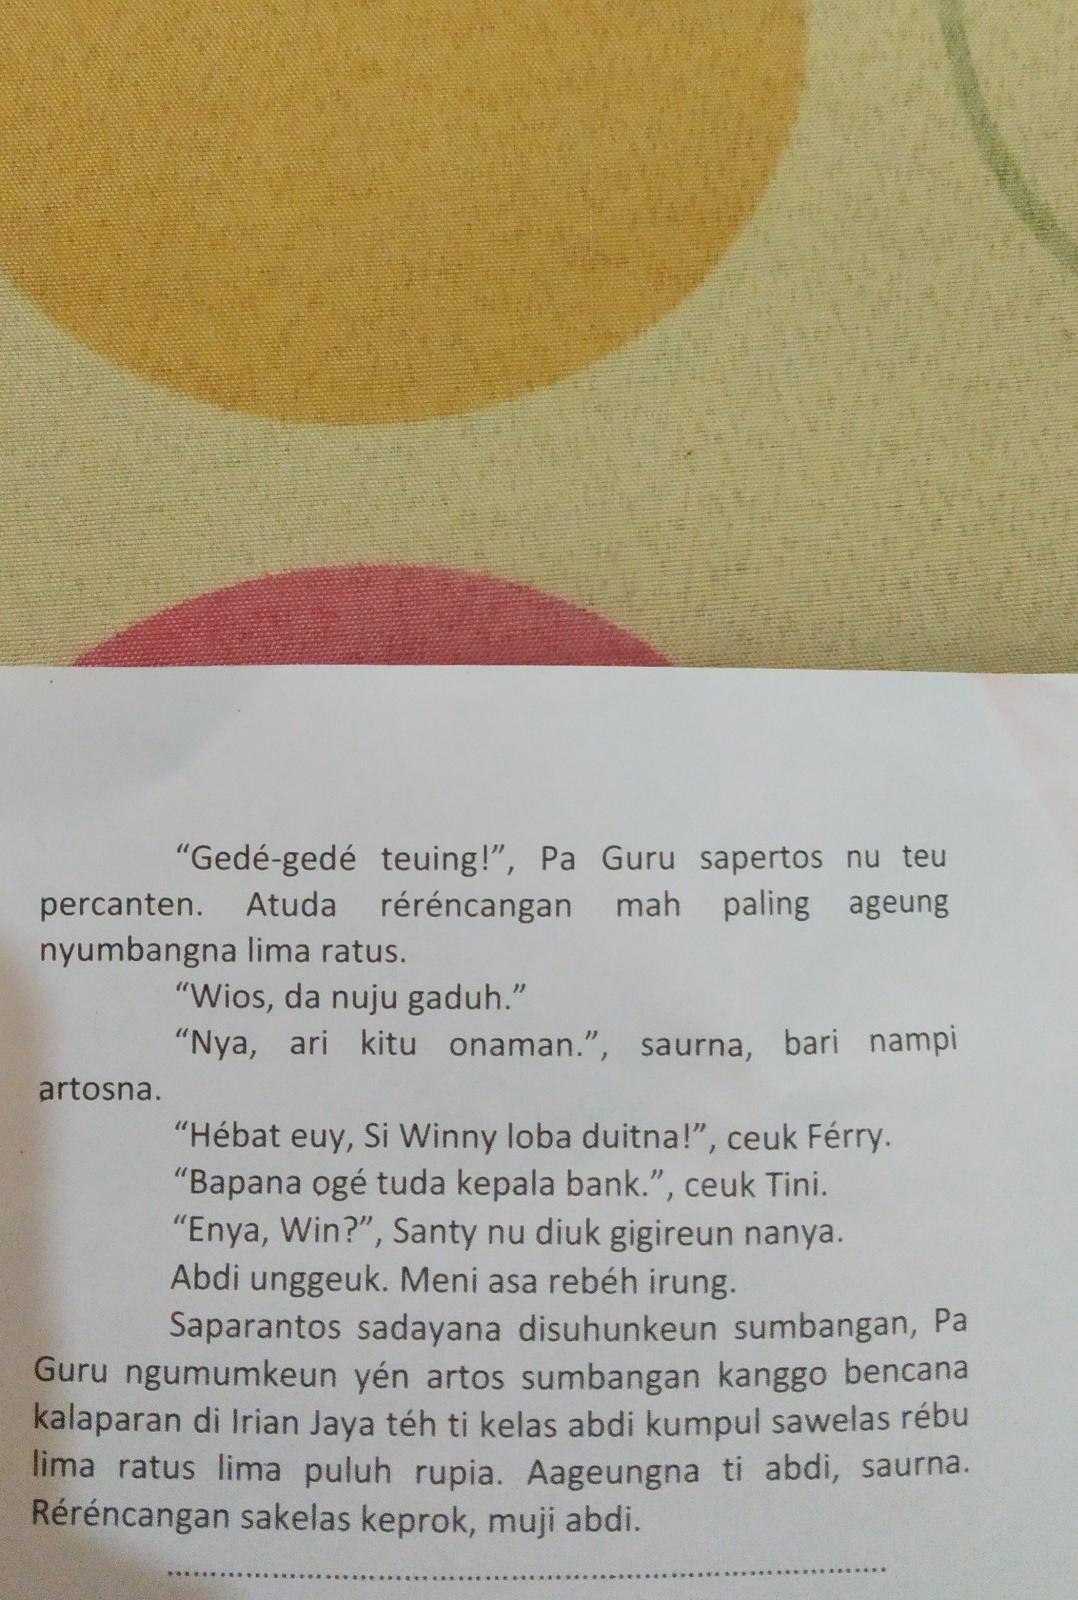 Teks Drama Bahasa Sunda Buat 7 Orang 3 Laki Laki 4